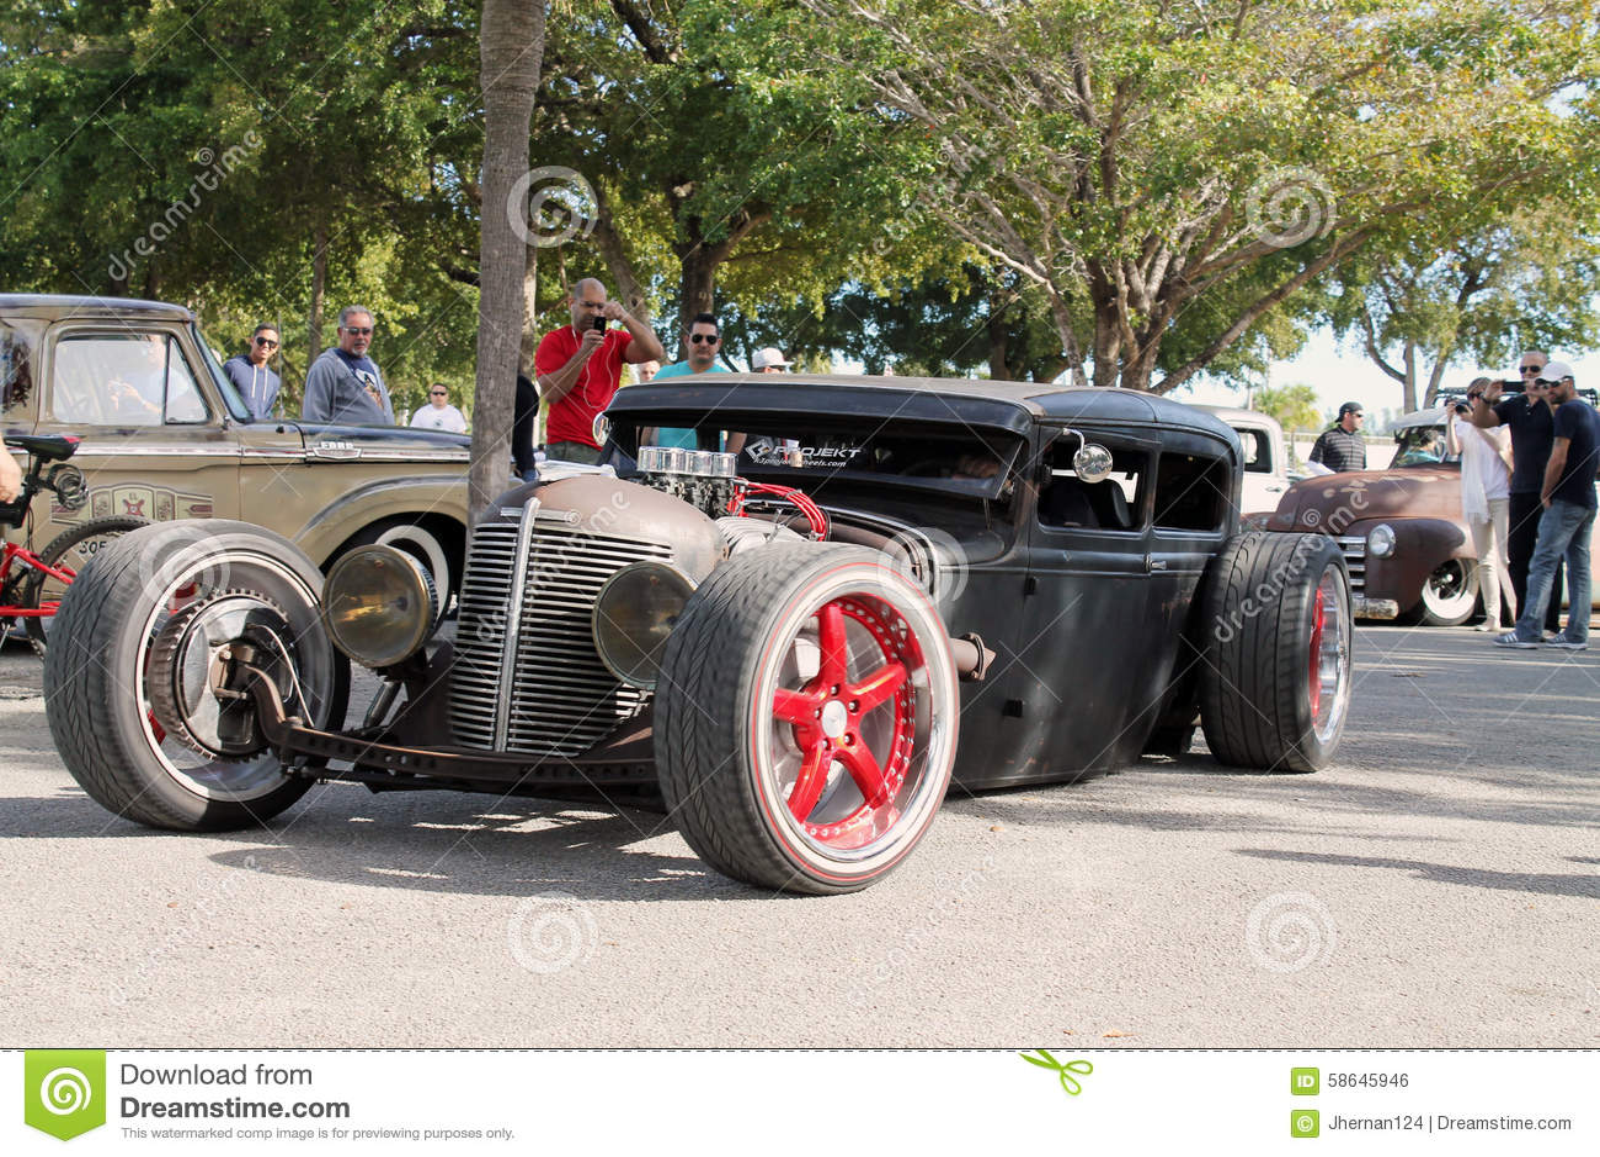 Old Rusty Rod car editorial photo. Image of americana - 58645946